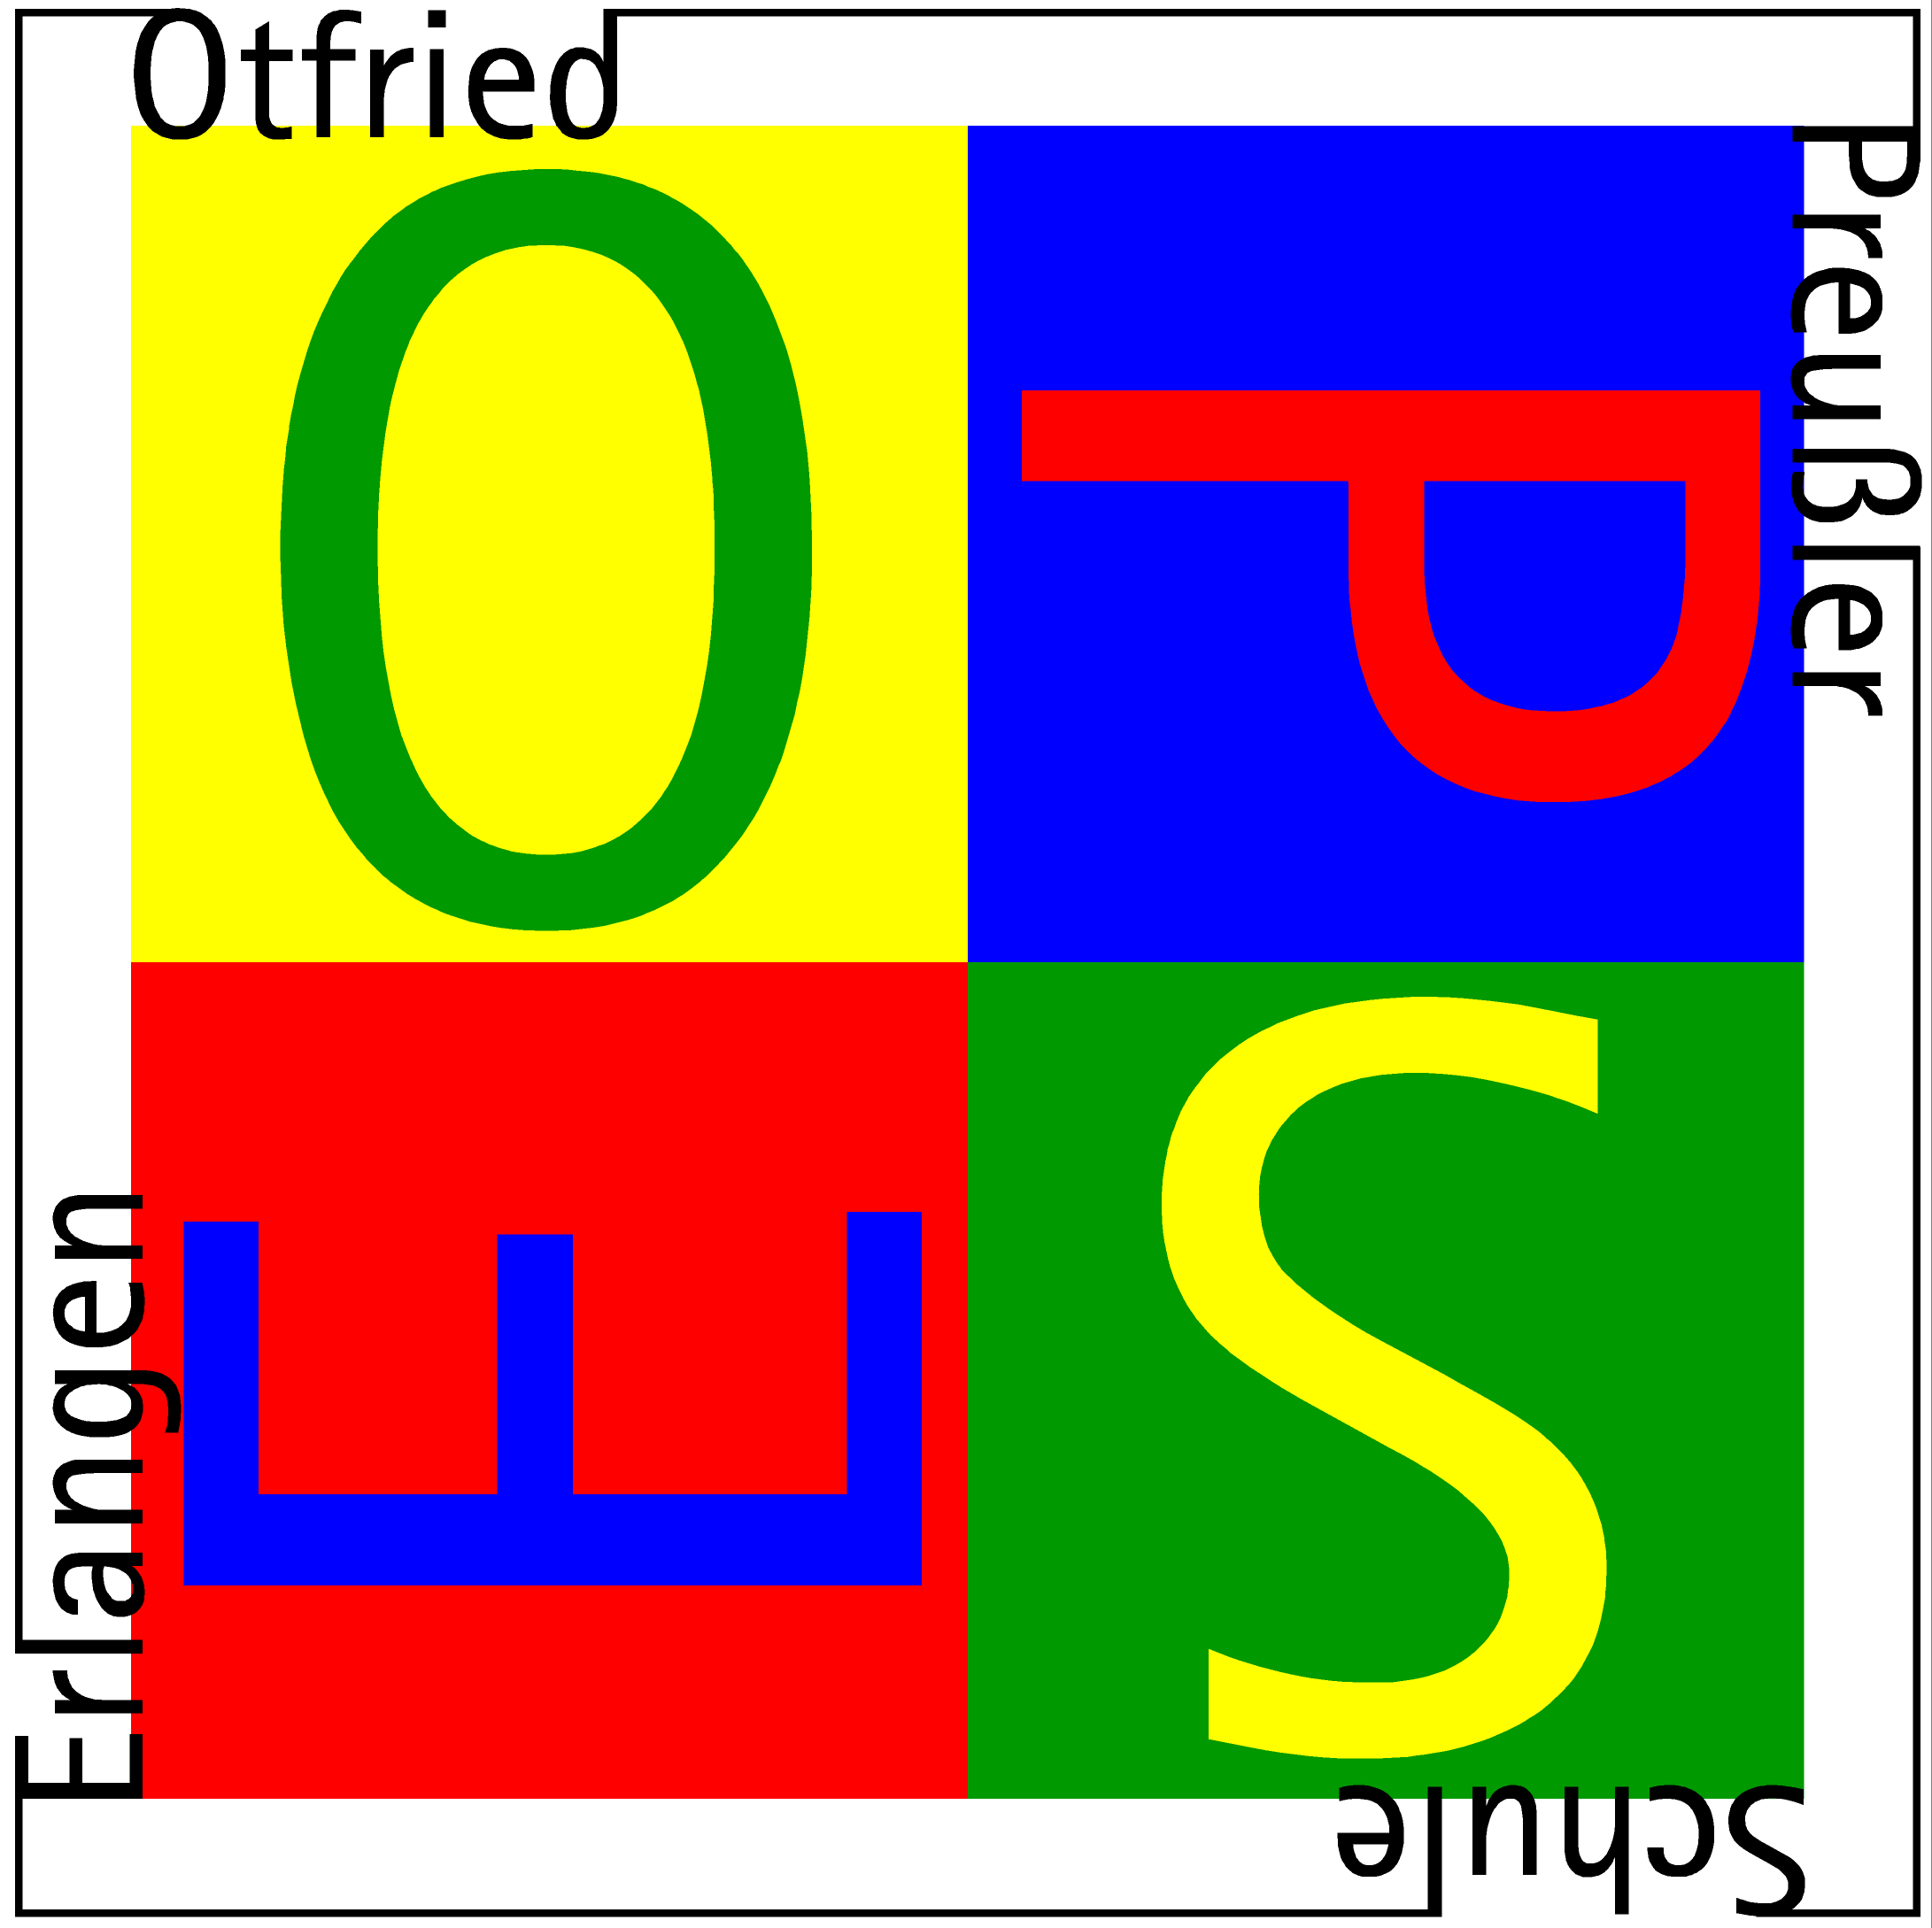 Logo der Otfried-Preußler-Schule Erlangen